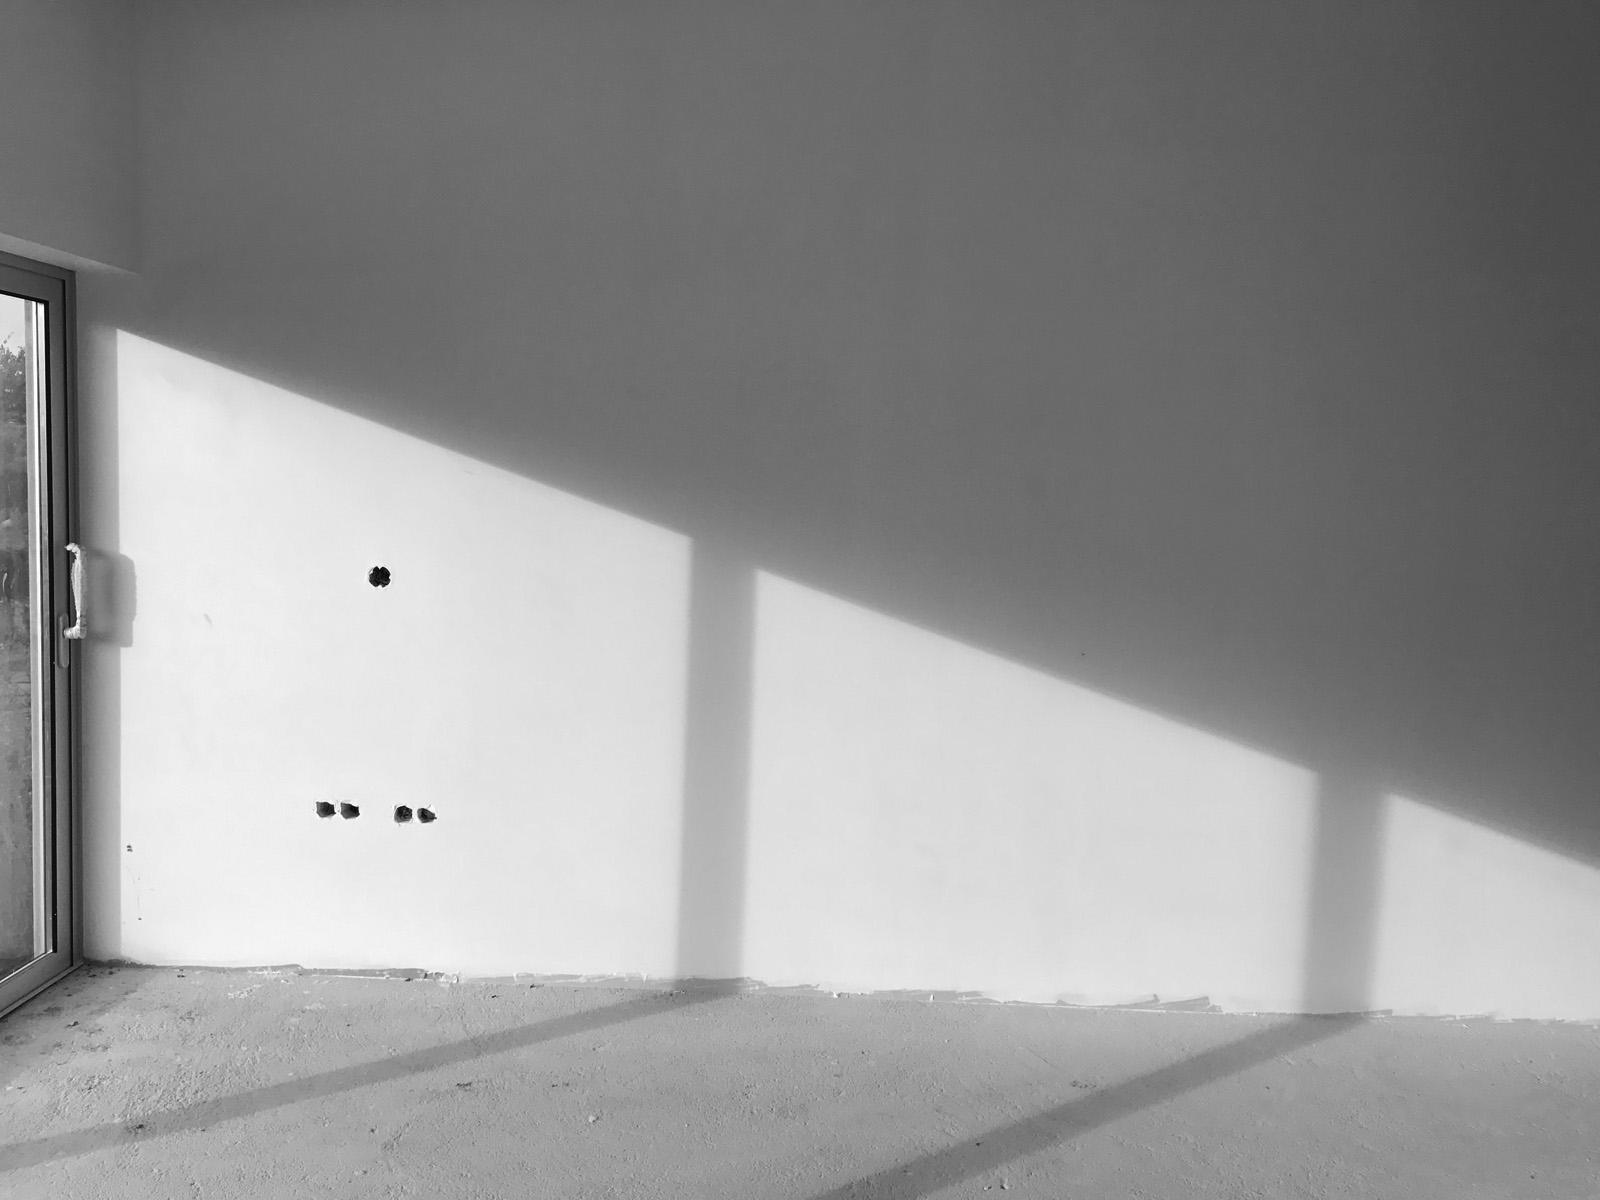 Moradia S+N - arquitectura - EVA evolutionary architecture - arquitectos porto - oliveira de azemeis (30).jpg